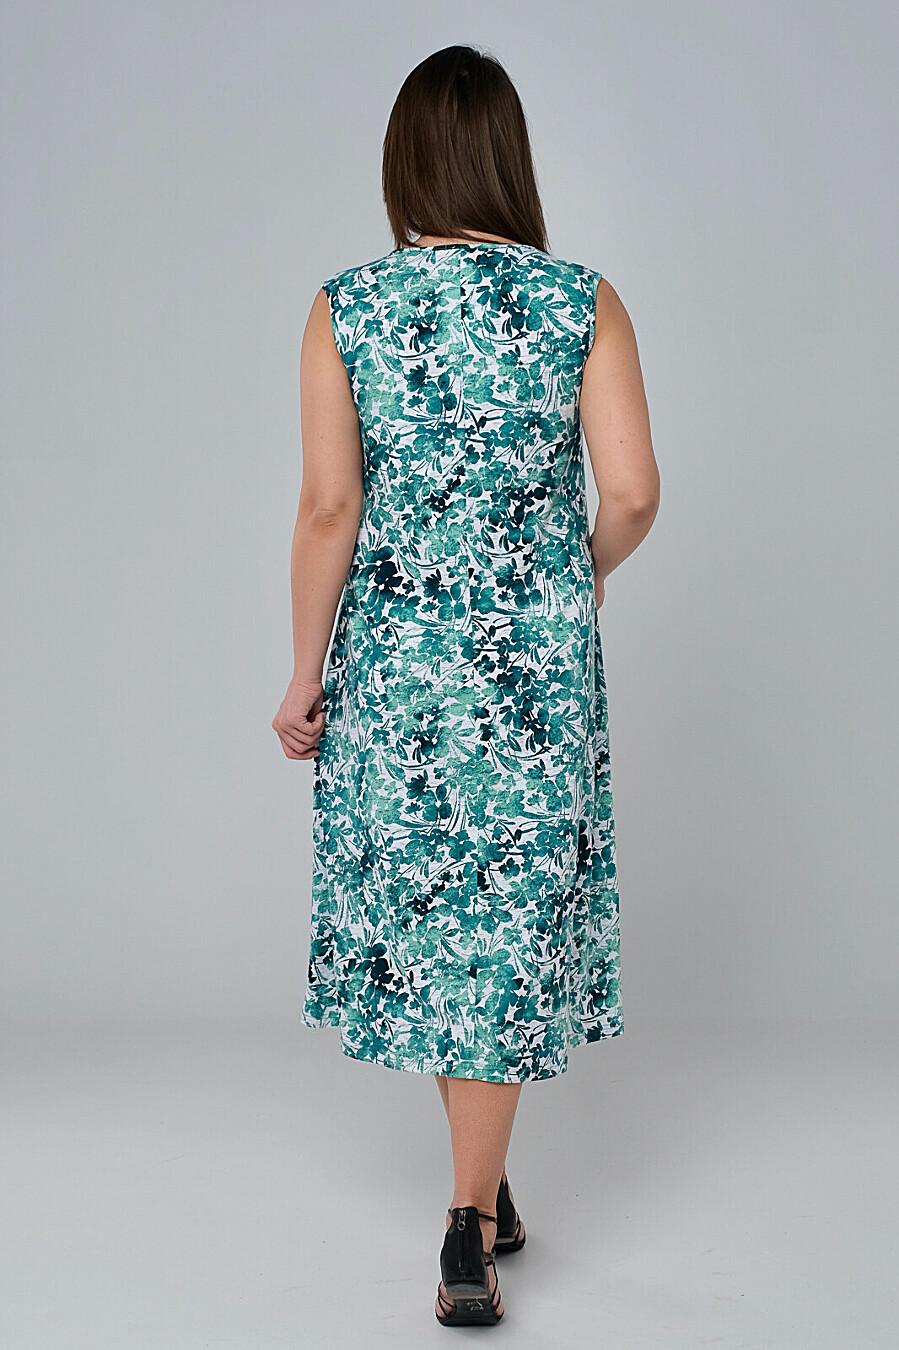 Сарафан ODEVAITE (308452), купить в Moyo.moda